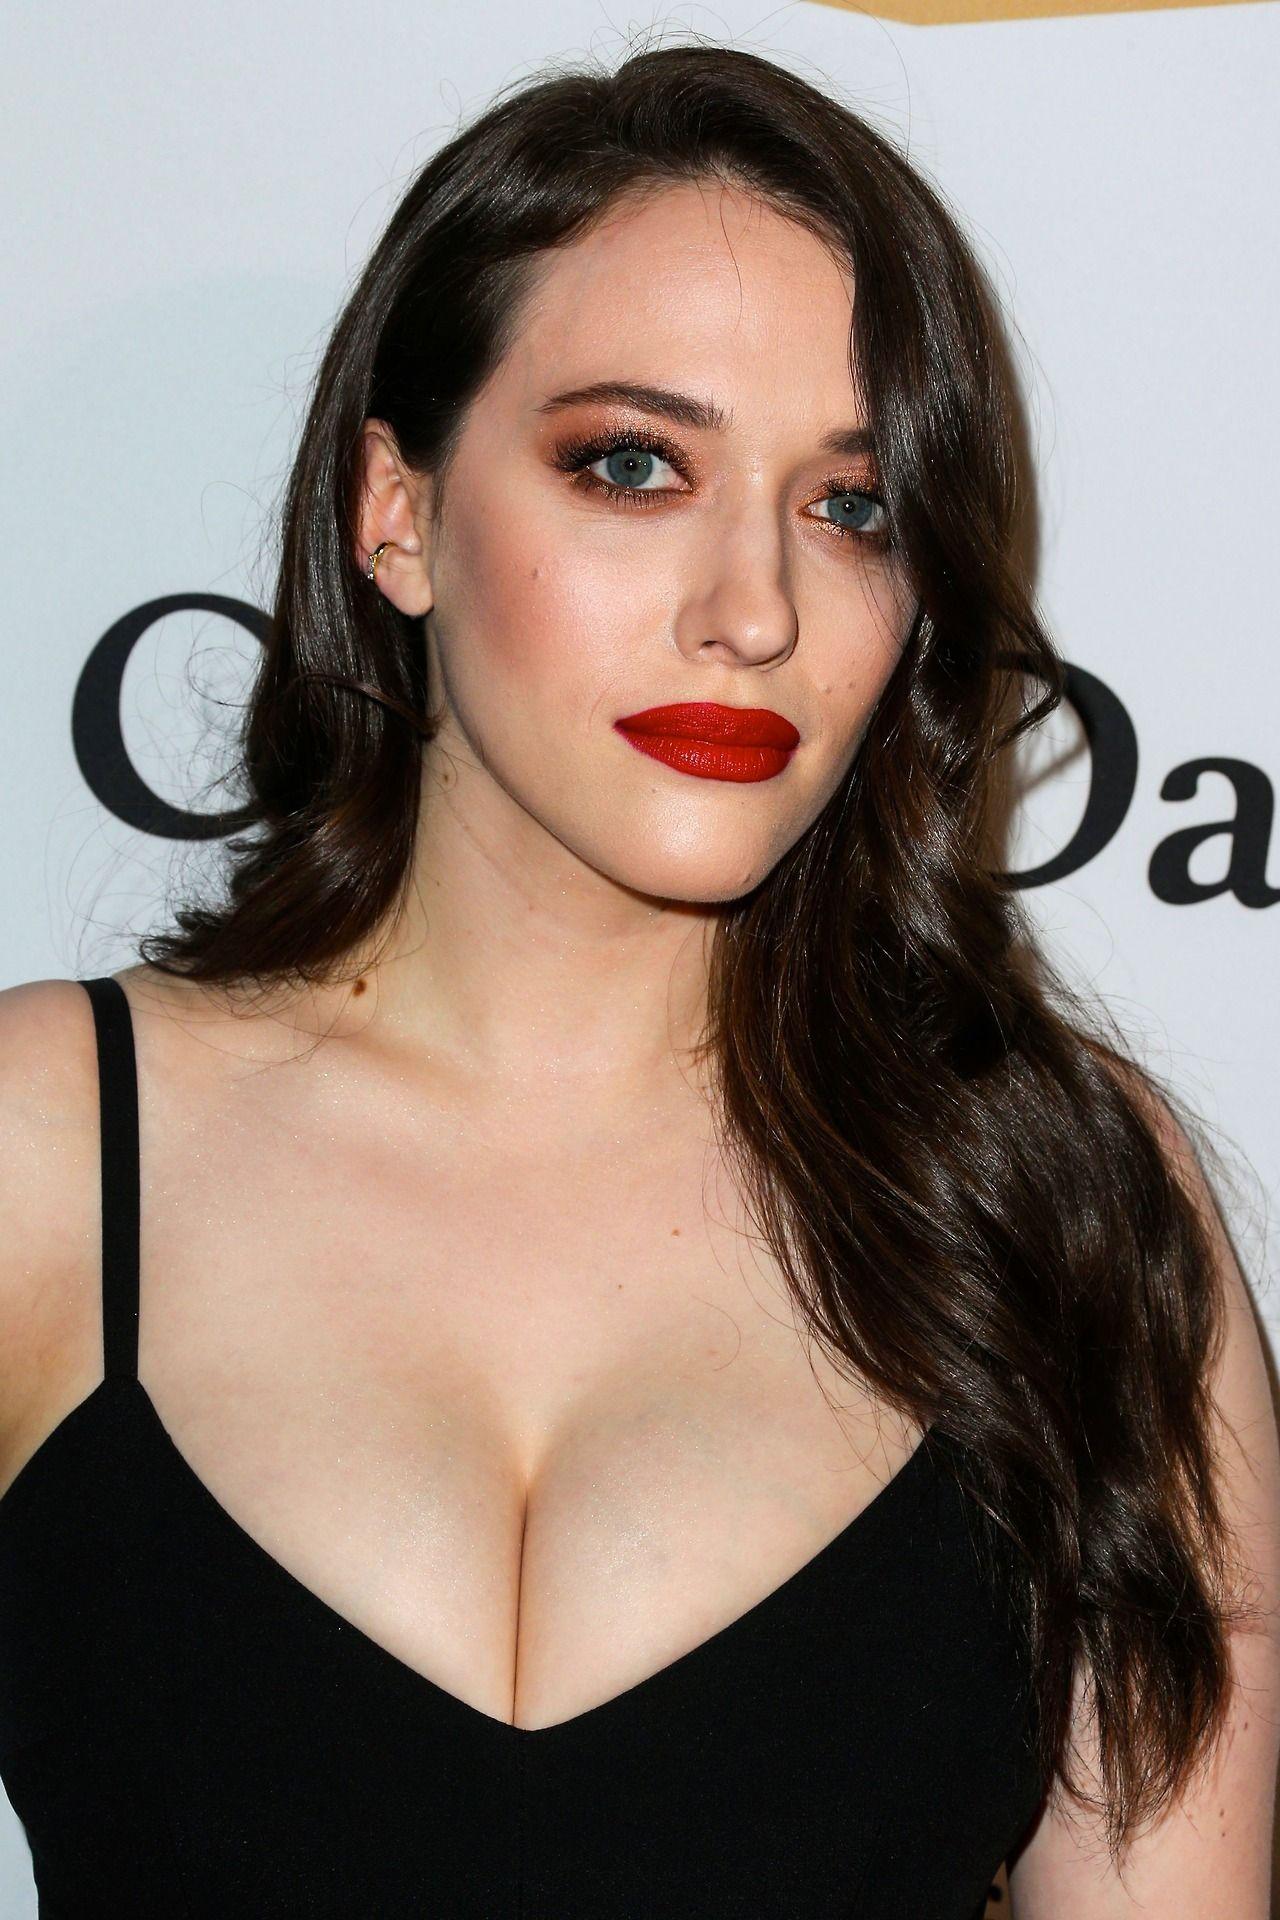 Paparazzi Megi Koleva nude (39 photo), Ass, Is a cute, Boobs, panties 2019